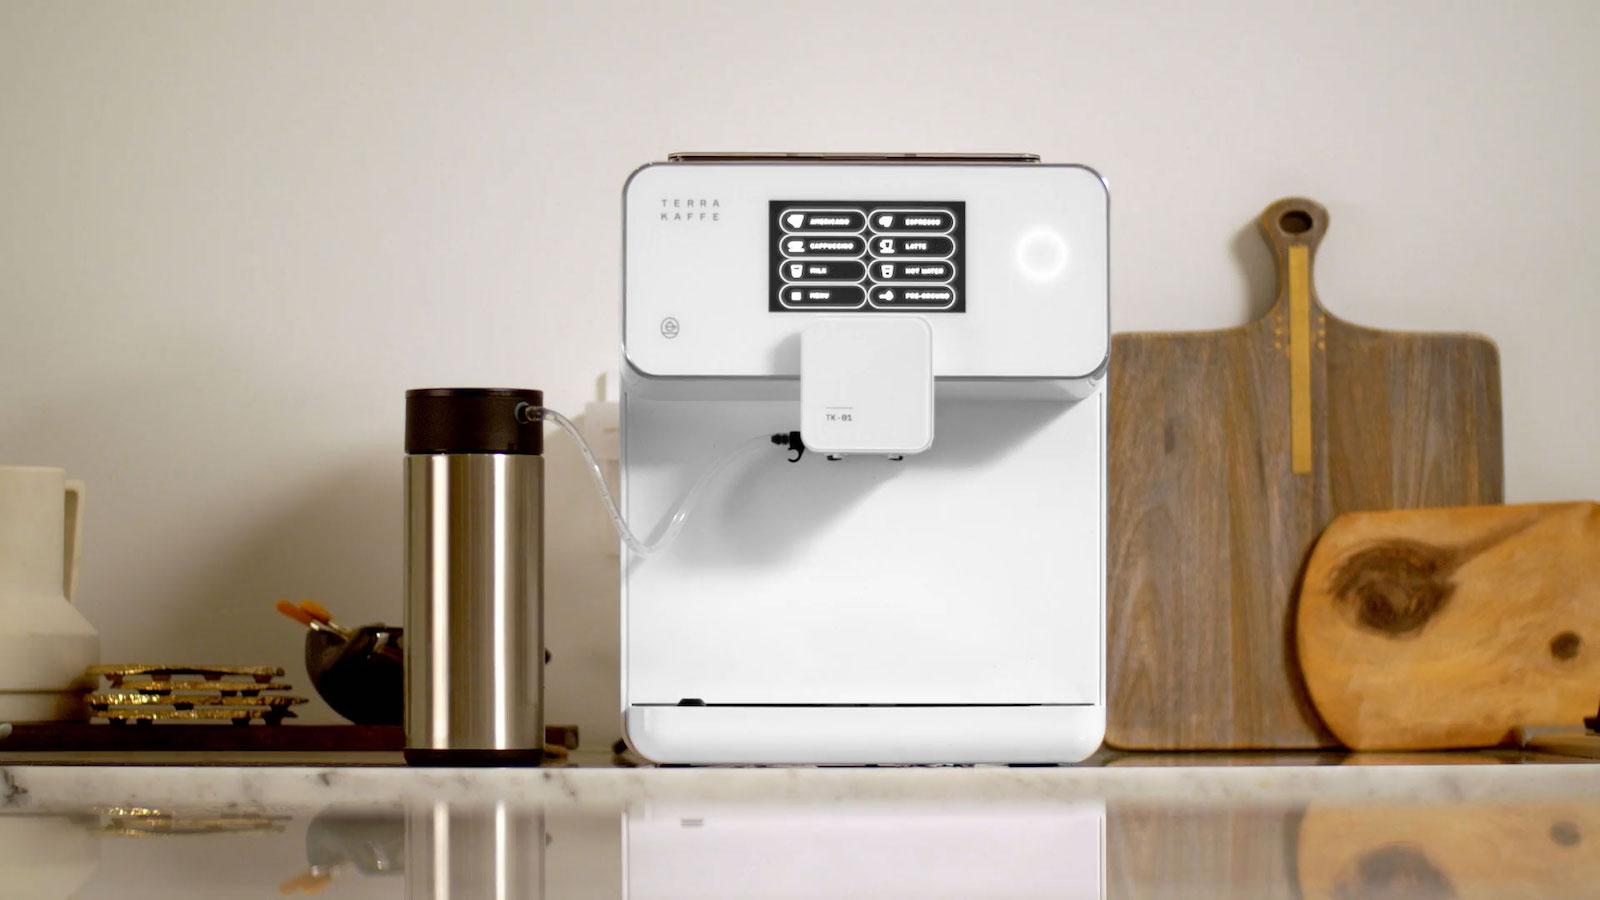 Terra Kaffe TK-01 coffee and espresso machine has a steel grinder